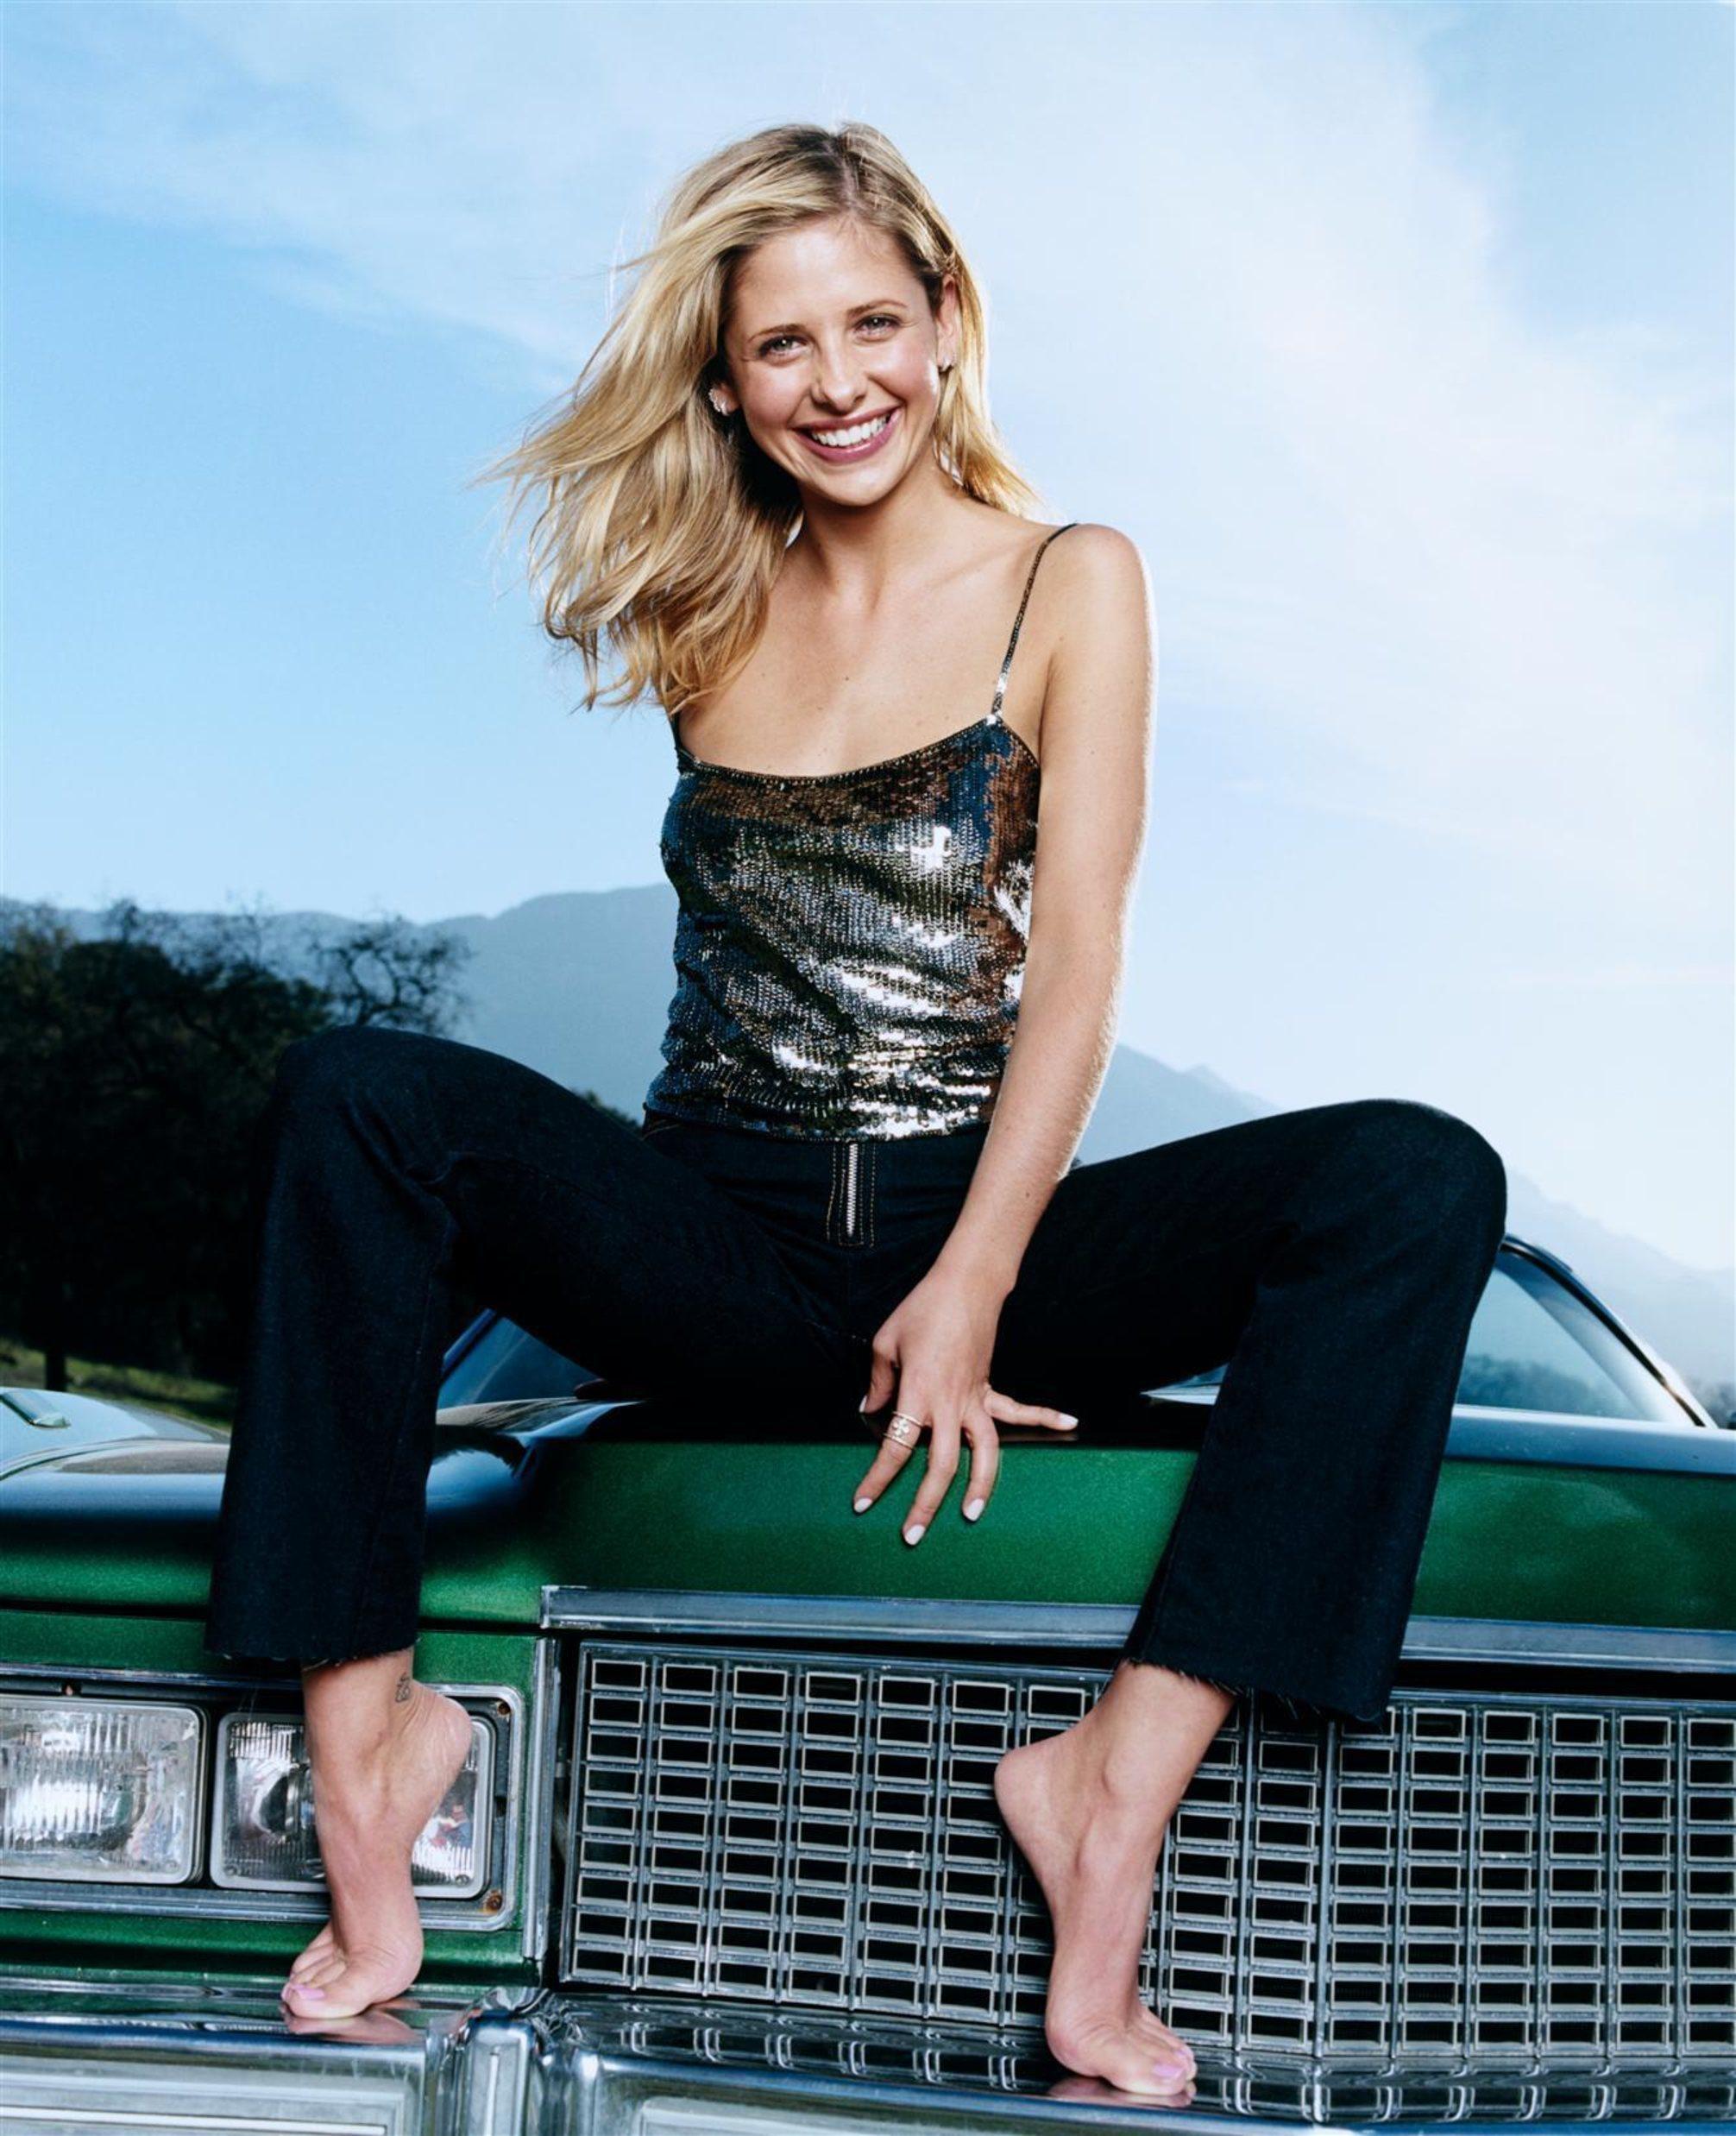 https://pics.wikifeet.com/Sarah-Michelle-Gellar-Feet-2626440.jpg